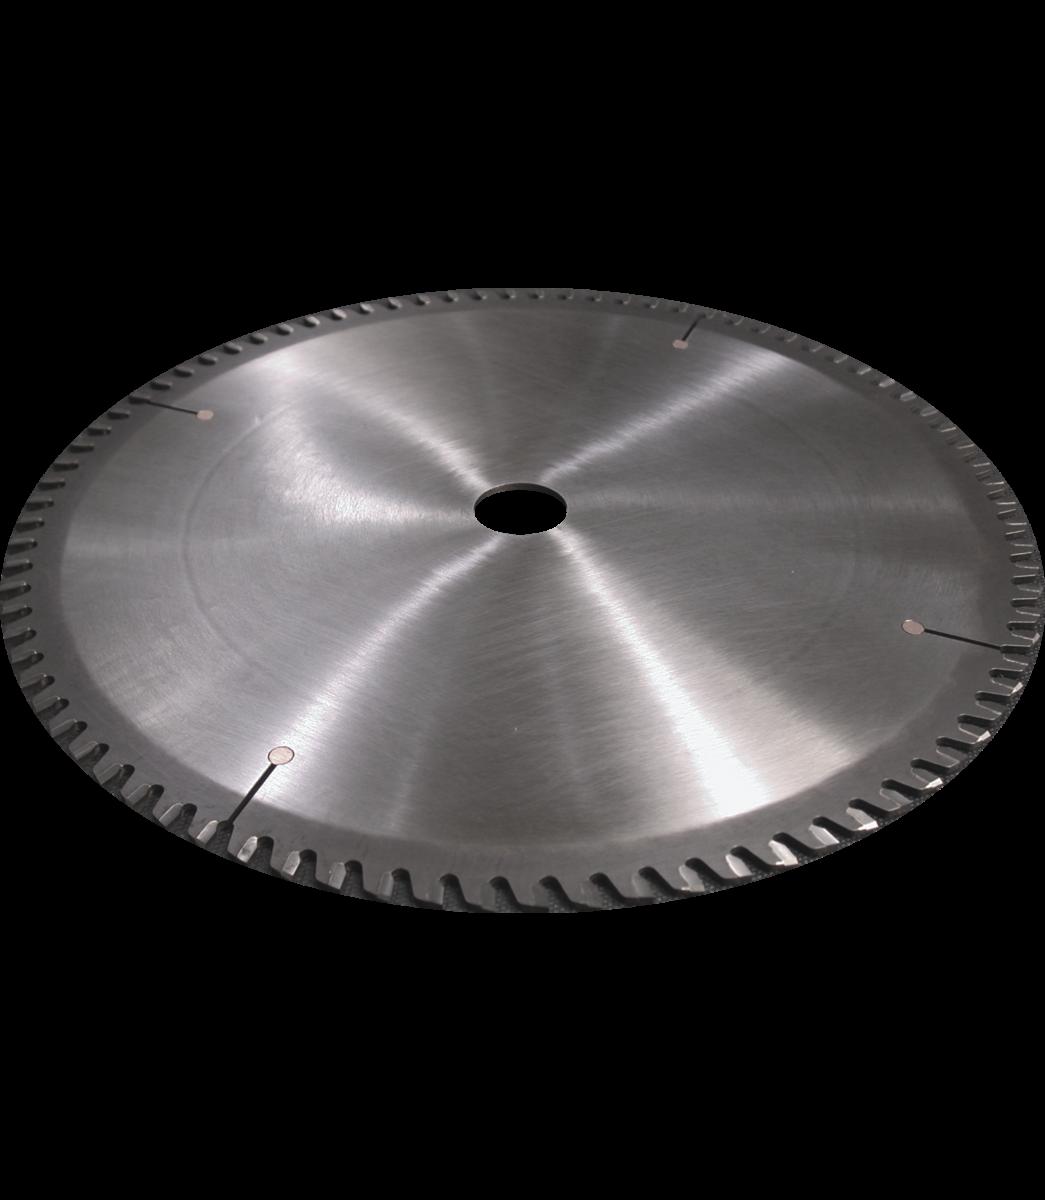 Non-Ferrous Carbide Circular Saw Blade 350mm x 32mm x 3.4mm x 84T For J-CK350-2/4K